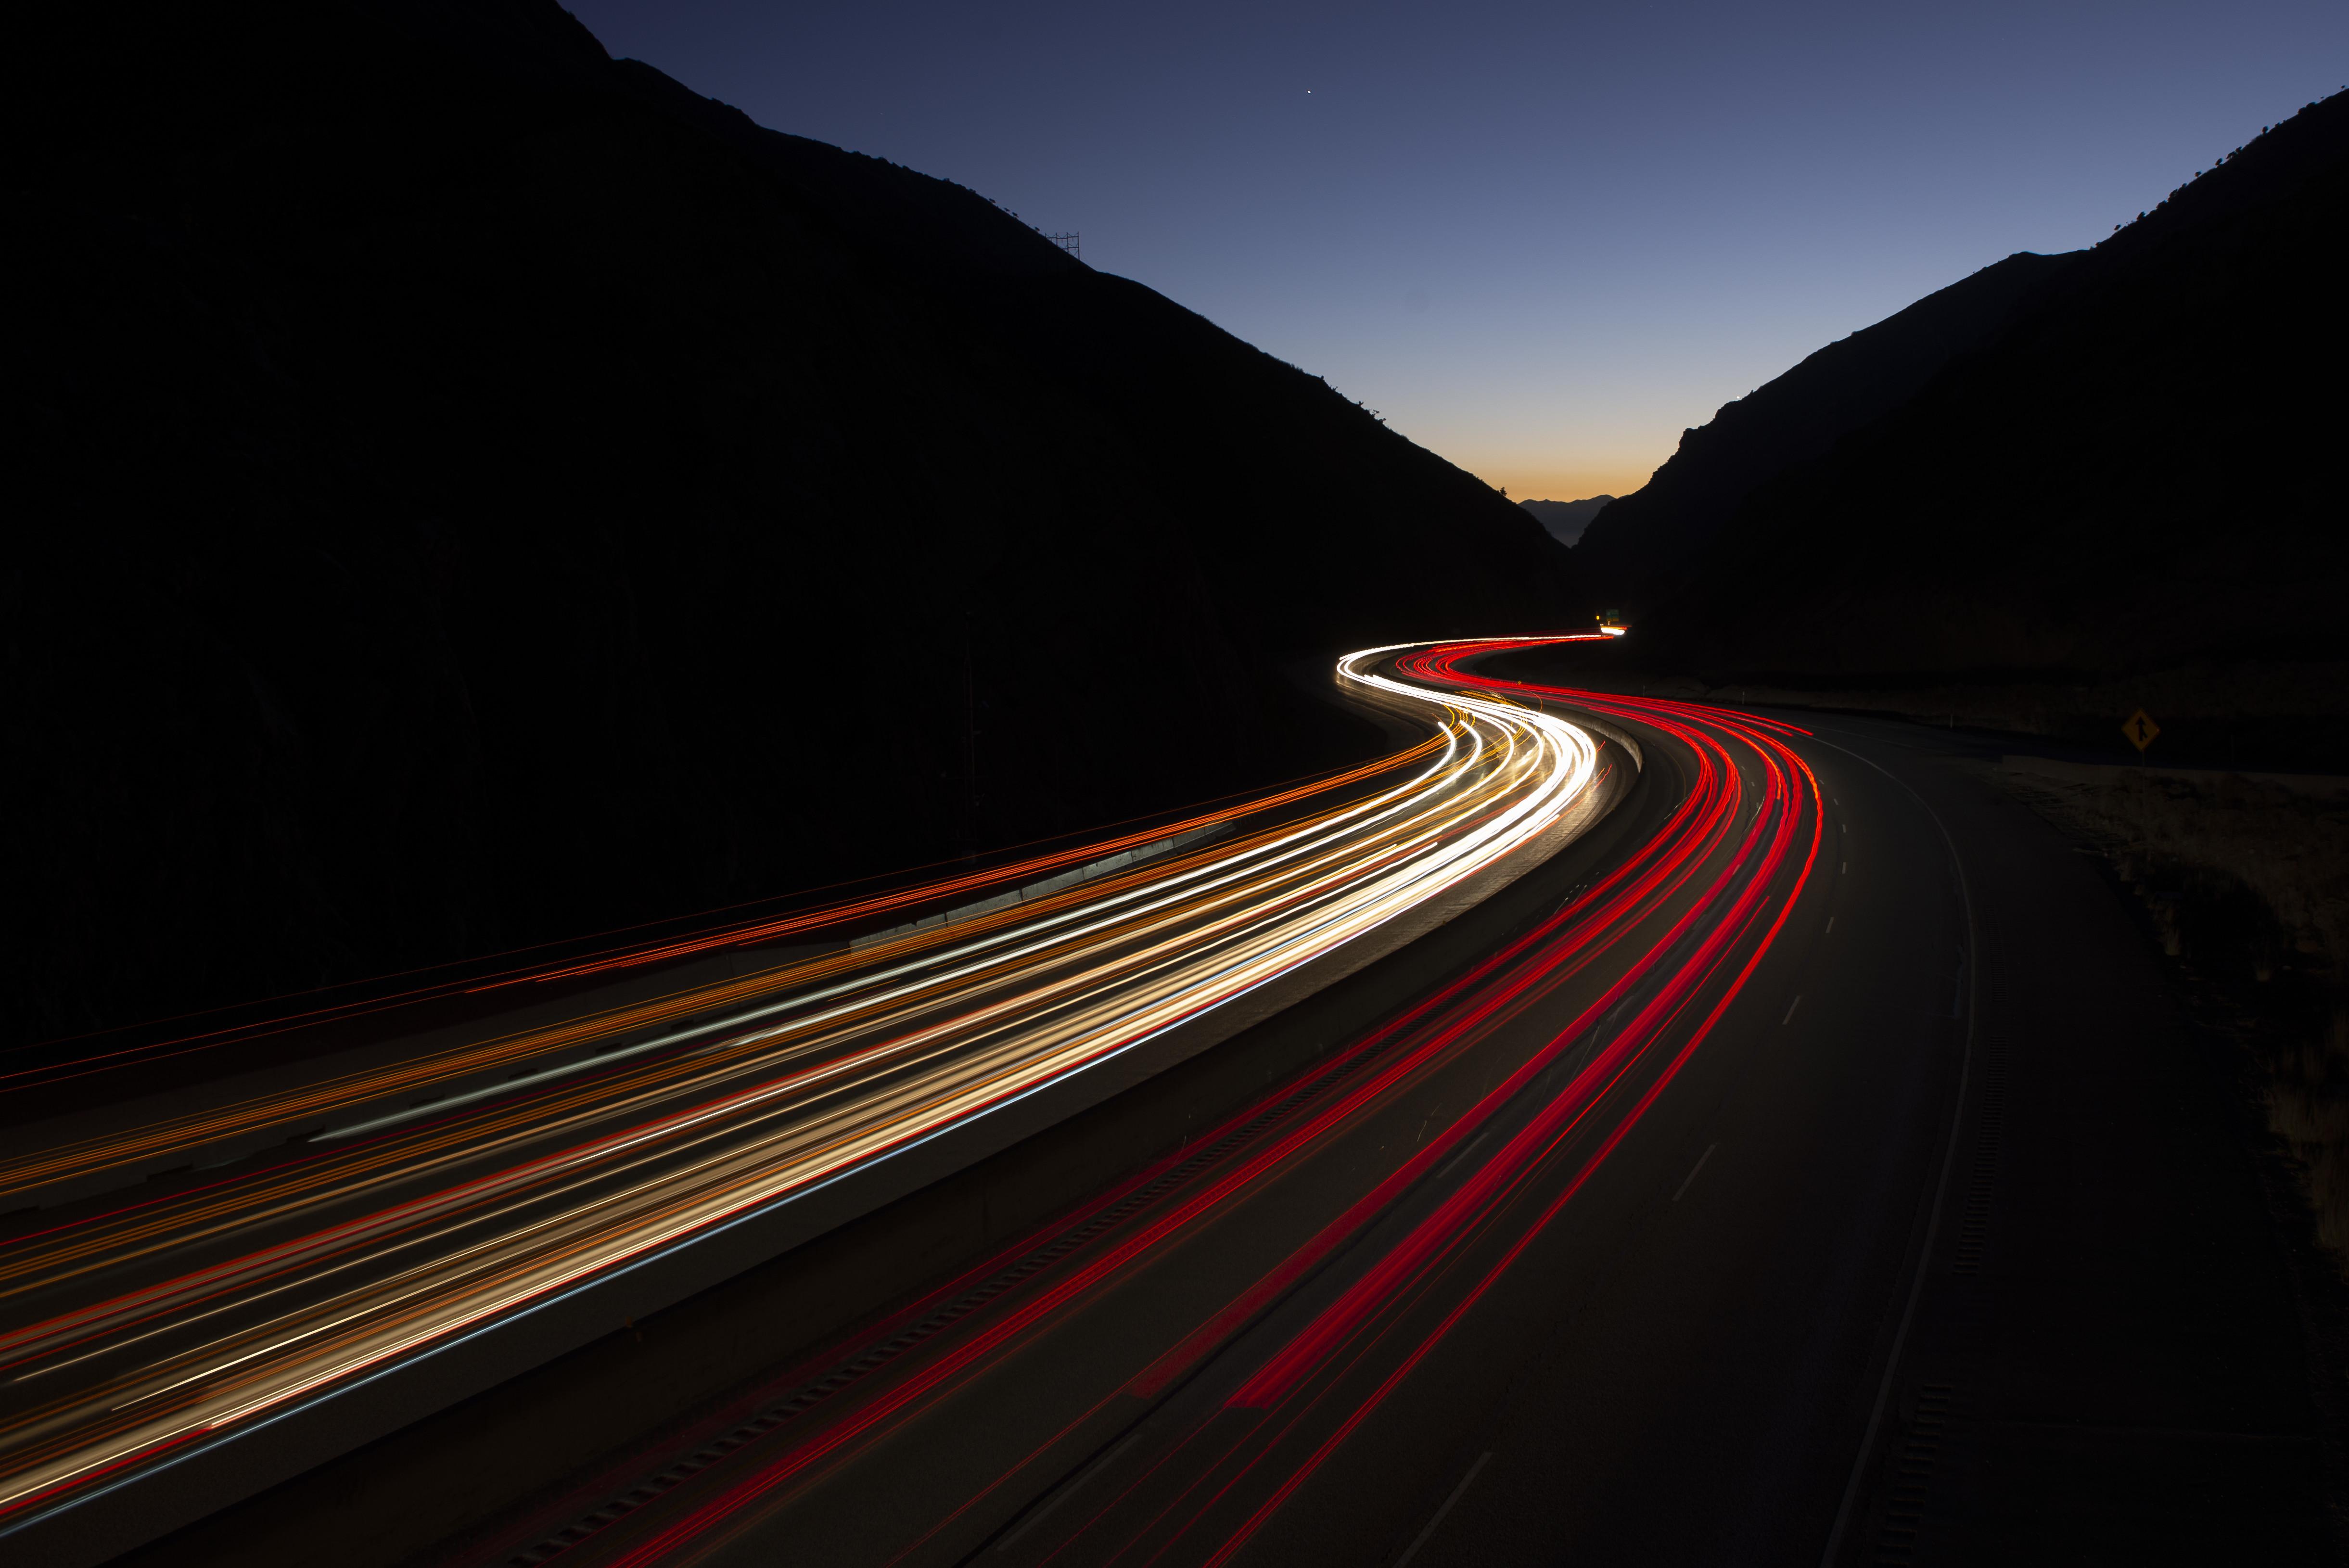 long exposure road 4k 1616091754 - Long Exposure Road 4k - Long Exposure Road 4k wallpapers